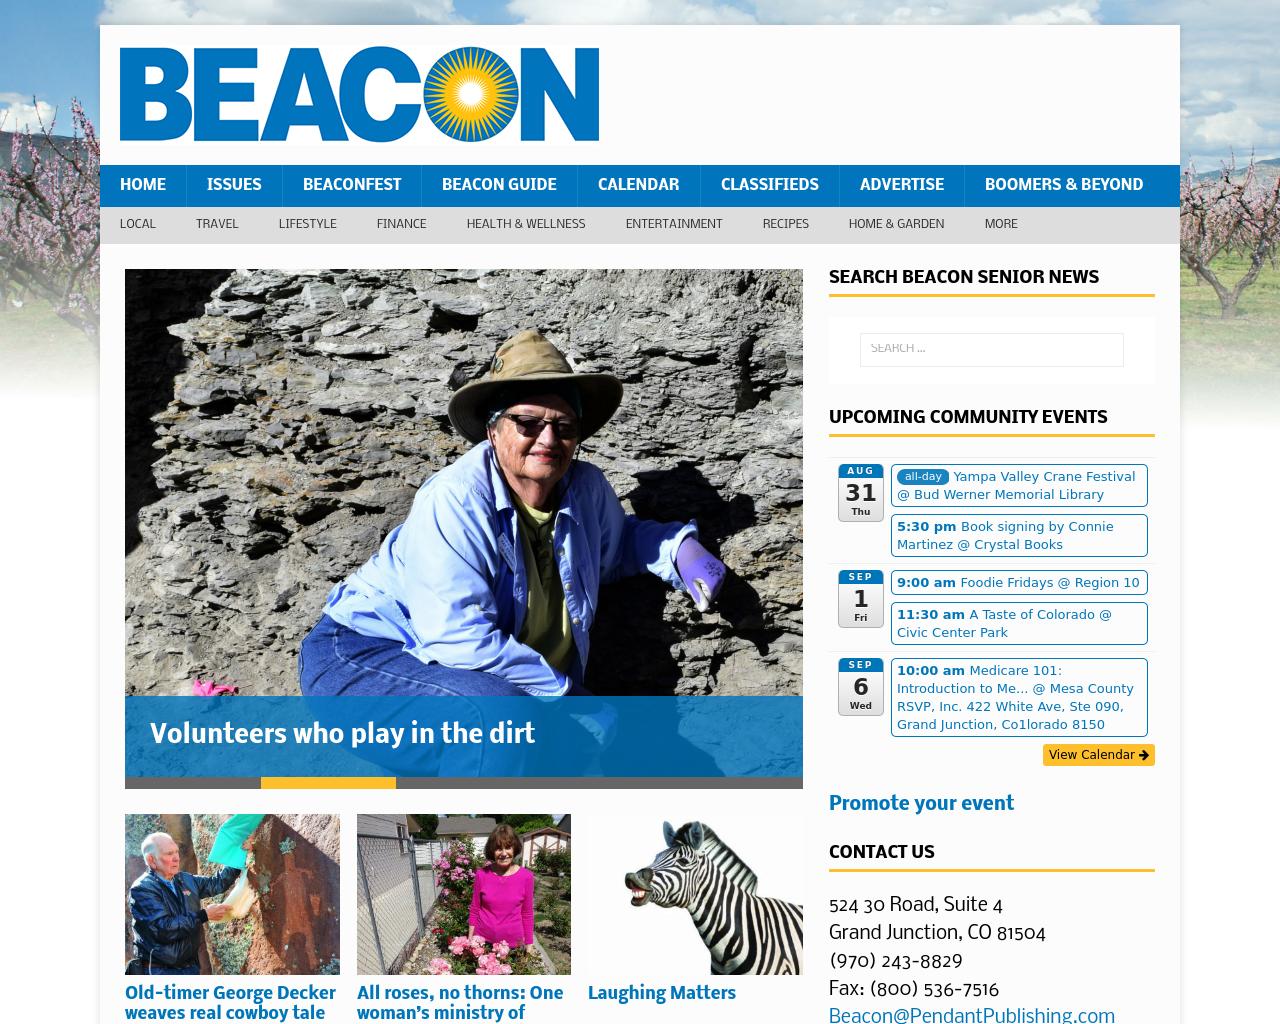 Beacon-Senior-News-Advertising-Reviews-Pricing